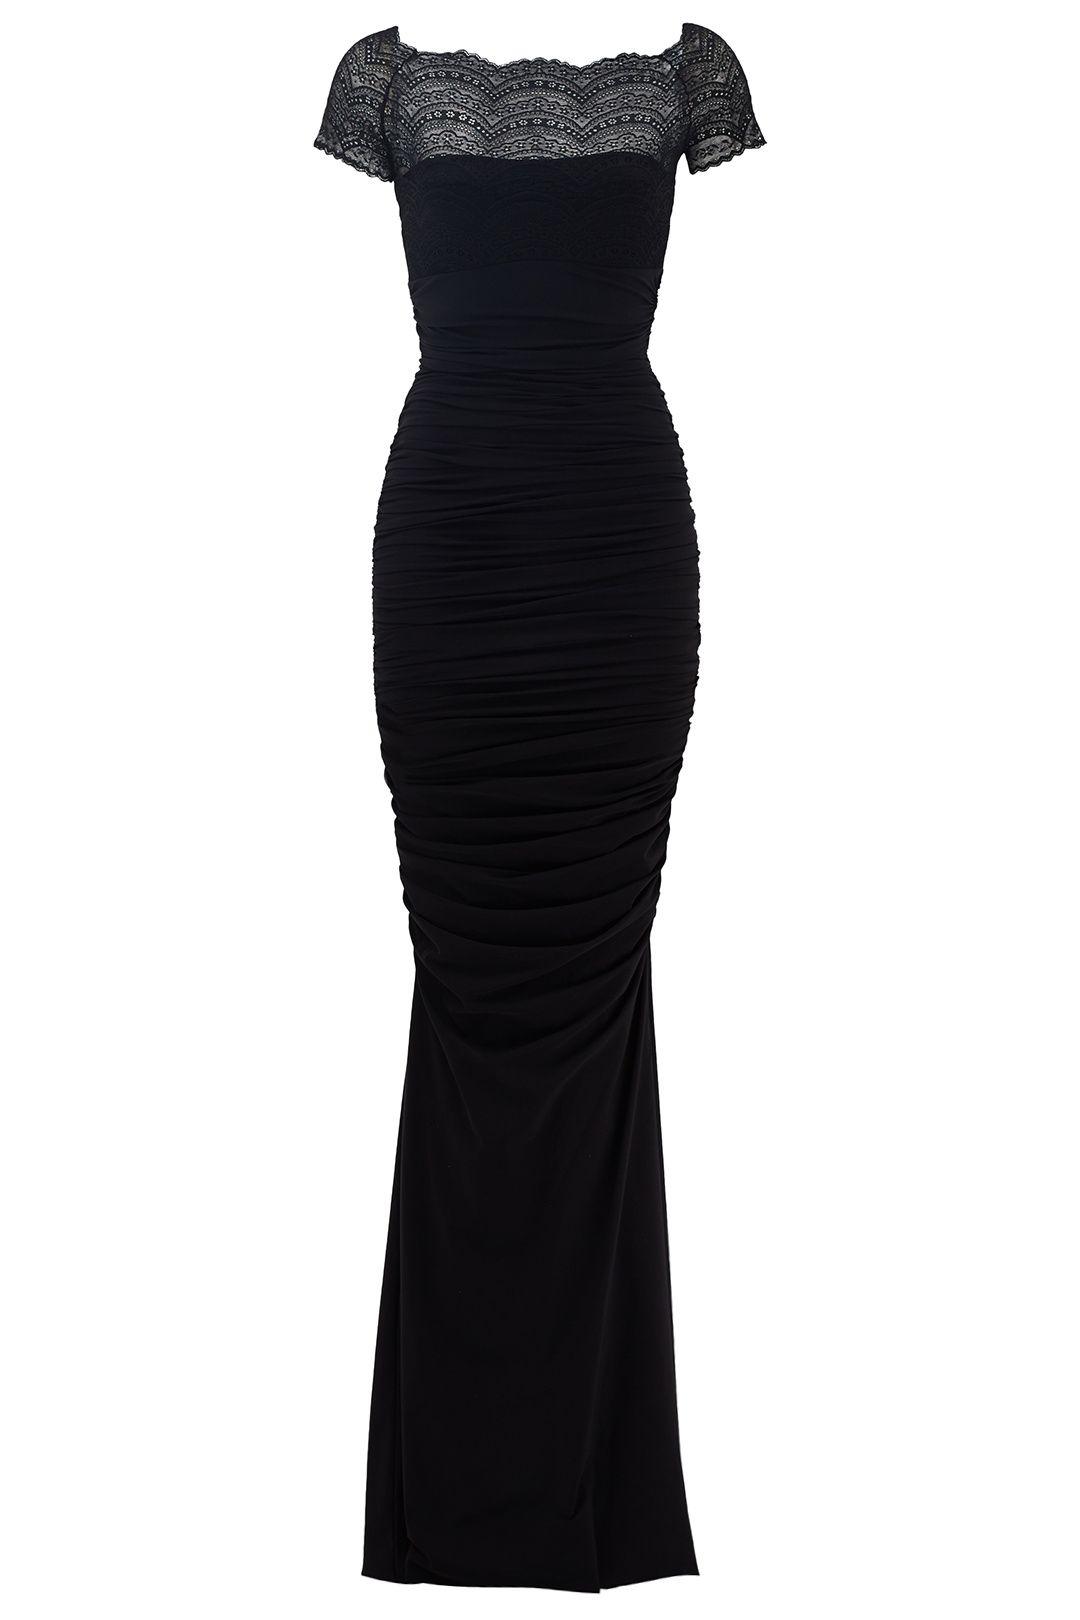 81f7c9c13a00 Black Nasira Gown by La Petite Robe di Chiara Boni for $150 | Rent The  Runway